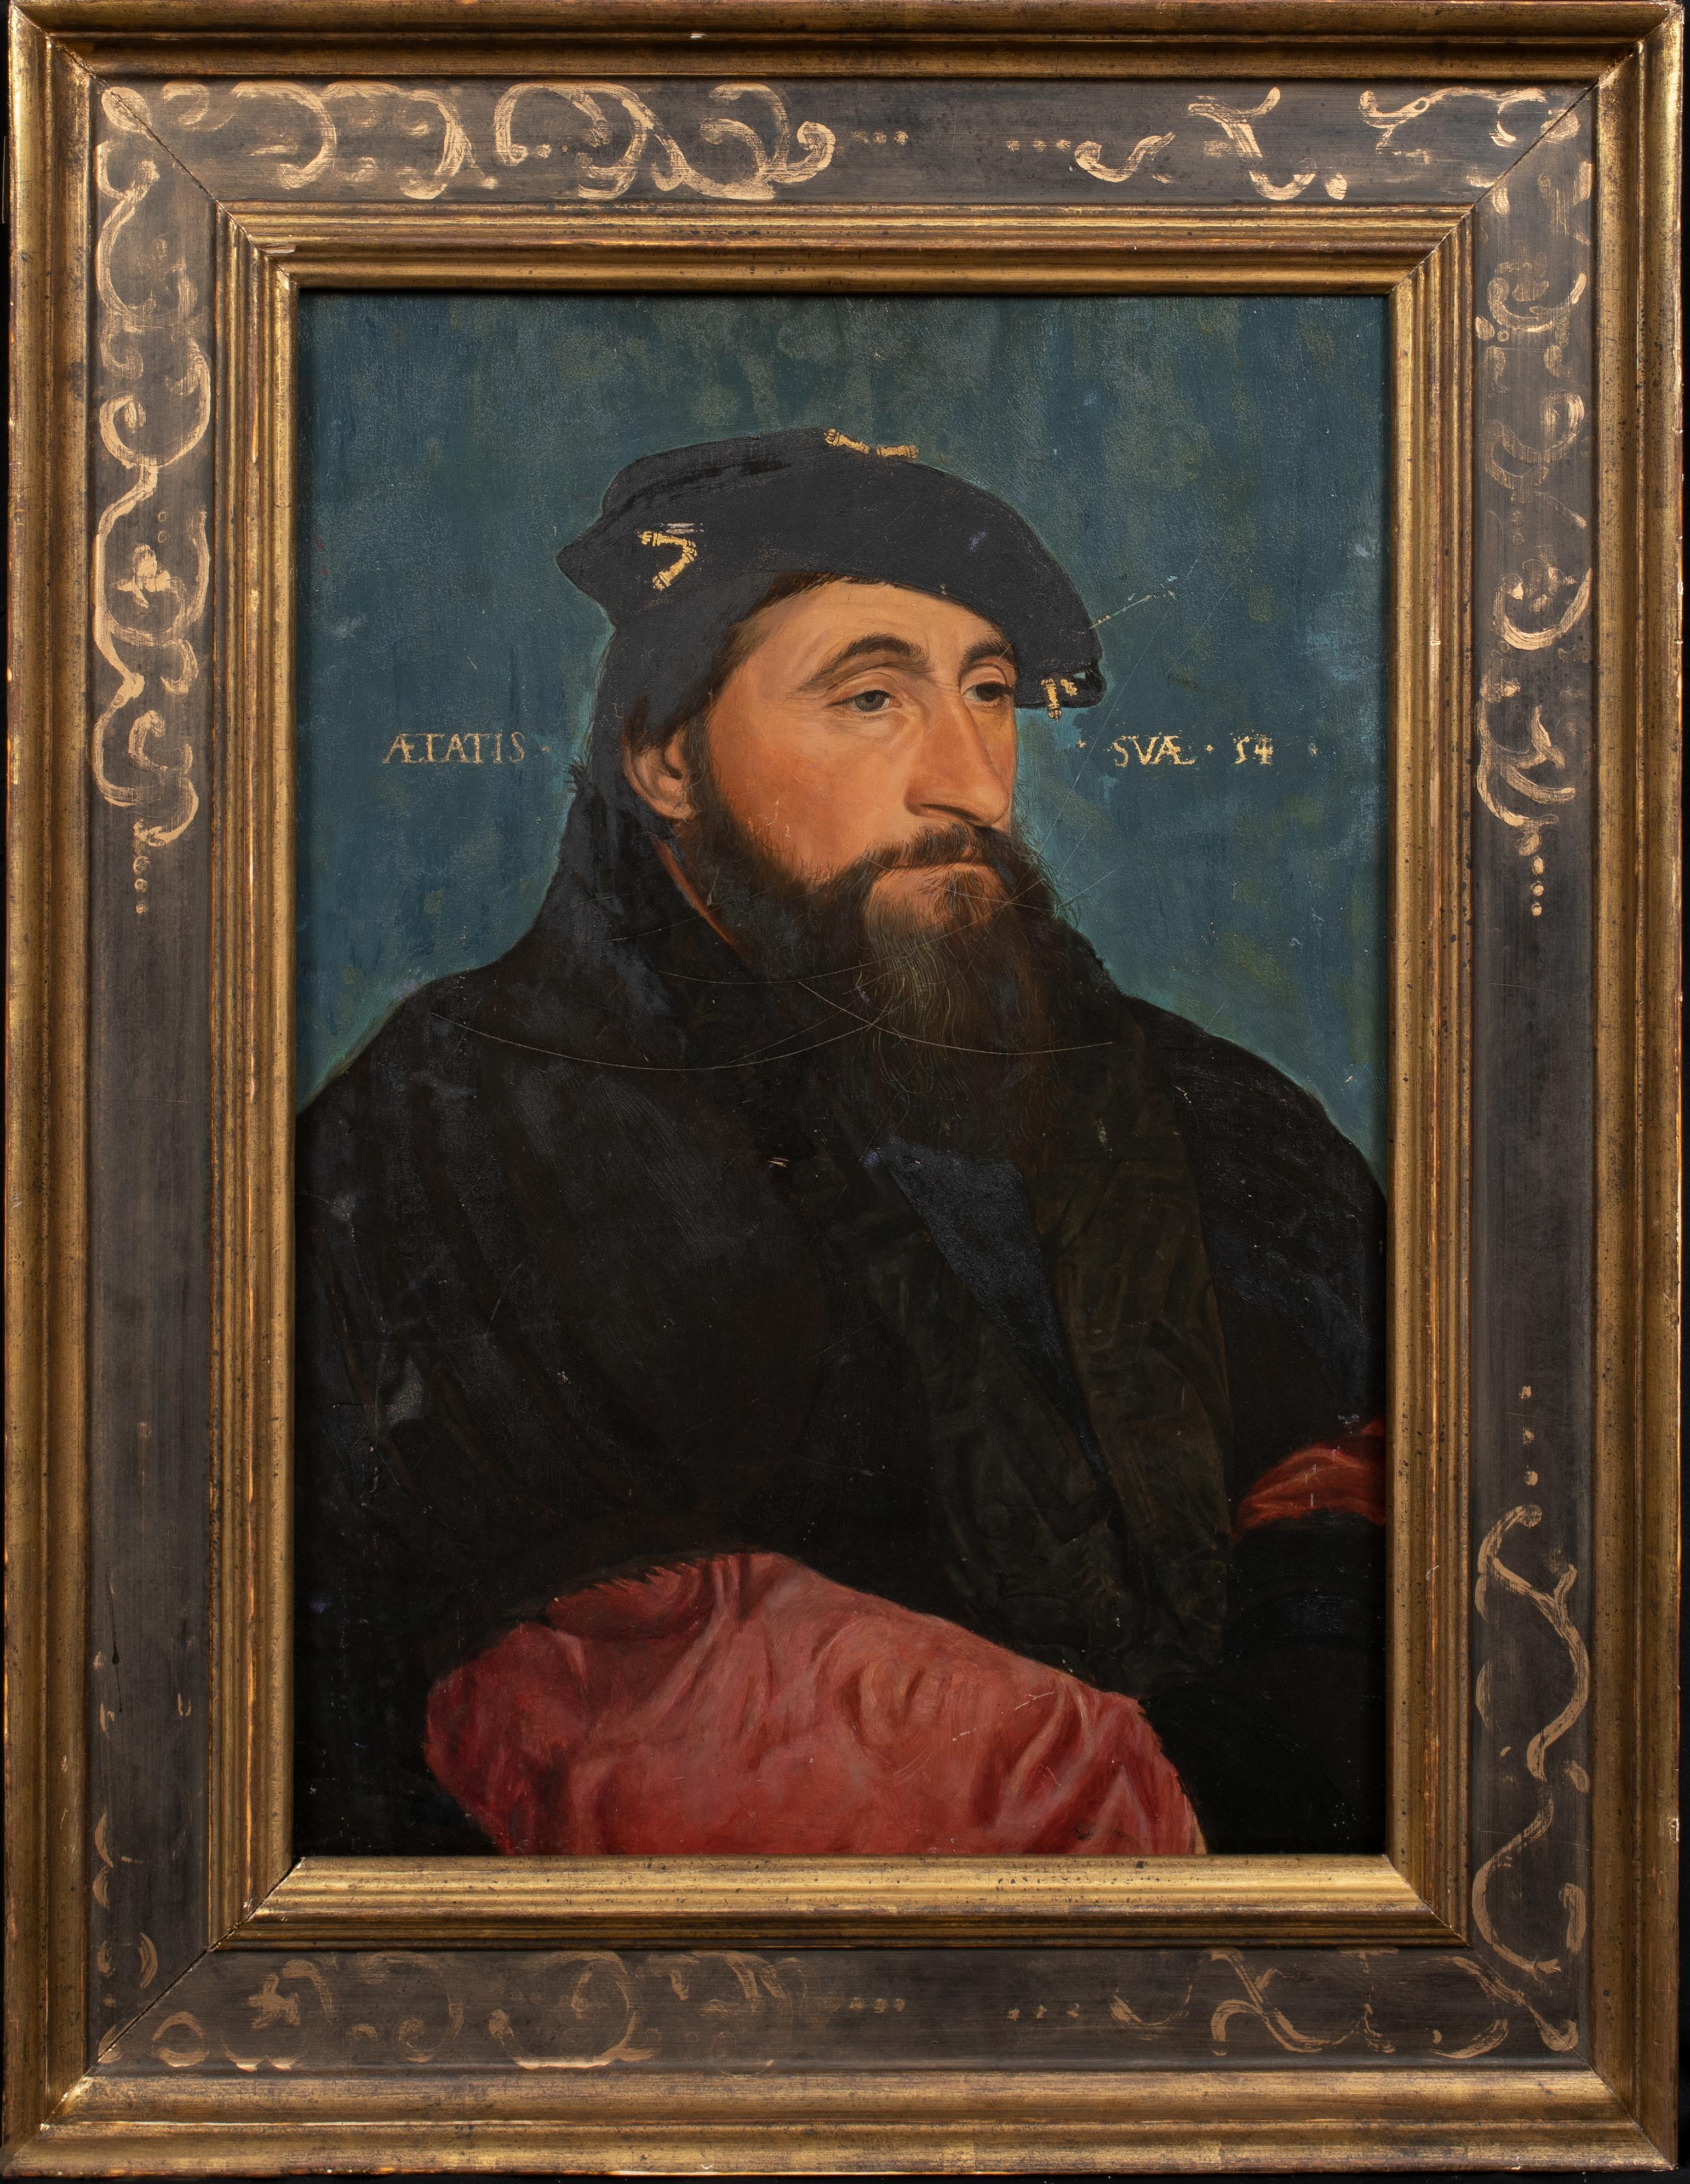 Portrait Of Antoine Le Bon Duke of Lorraine Count of Lotharingen (1489-1544)